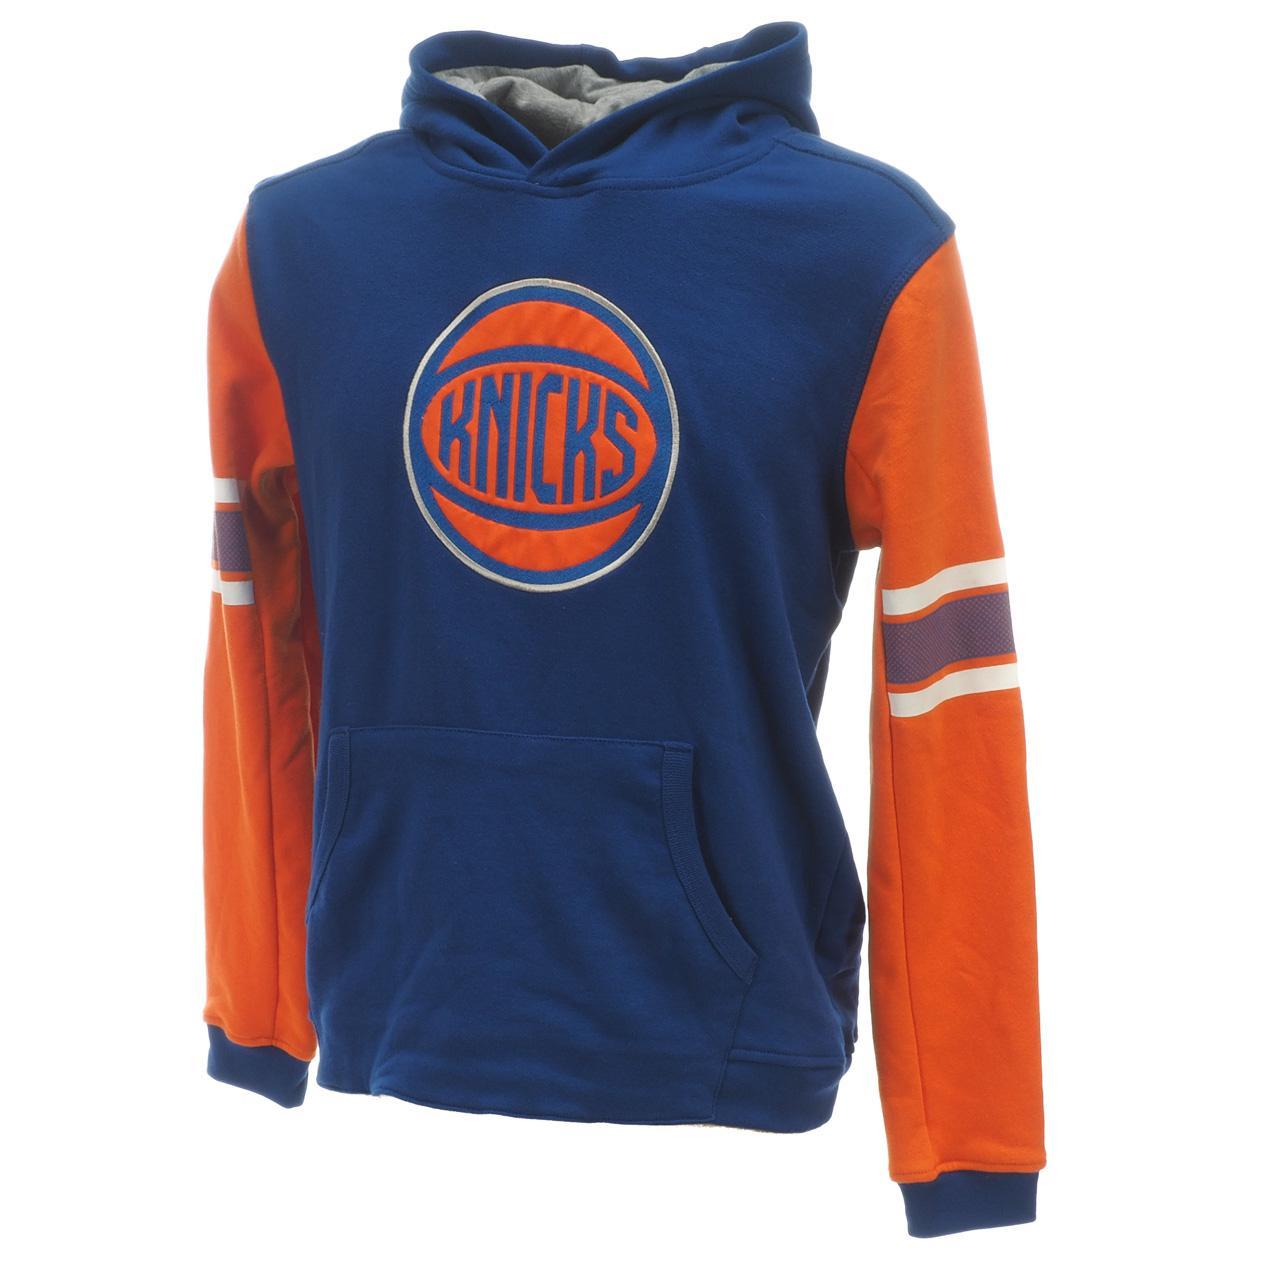 Sweatshirt-Kapuze-Kapuzenpulli-Outstuff-Knicks-Ny-Umhang-Okc-Blau-60529-Neu